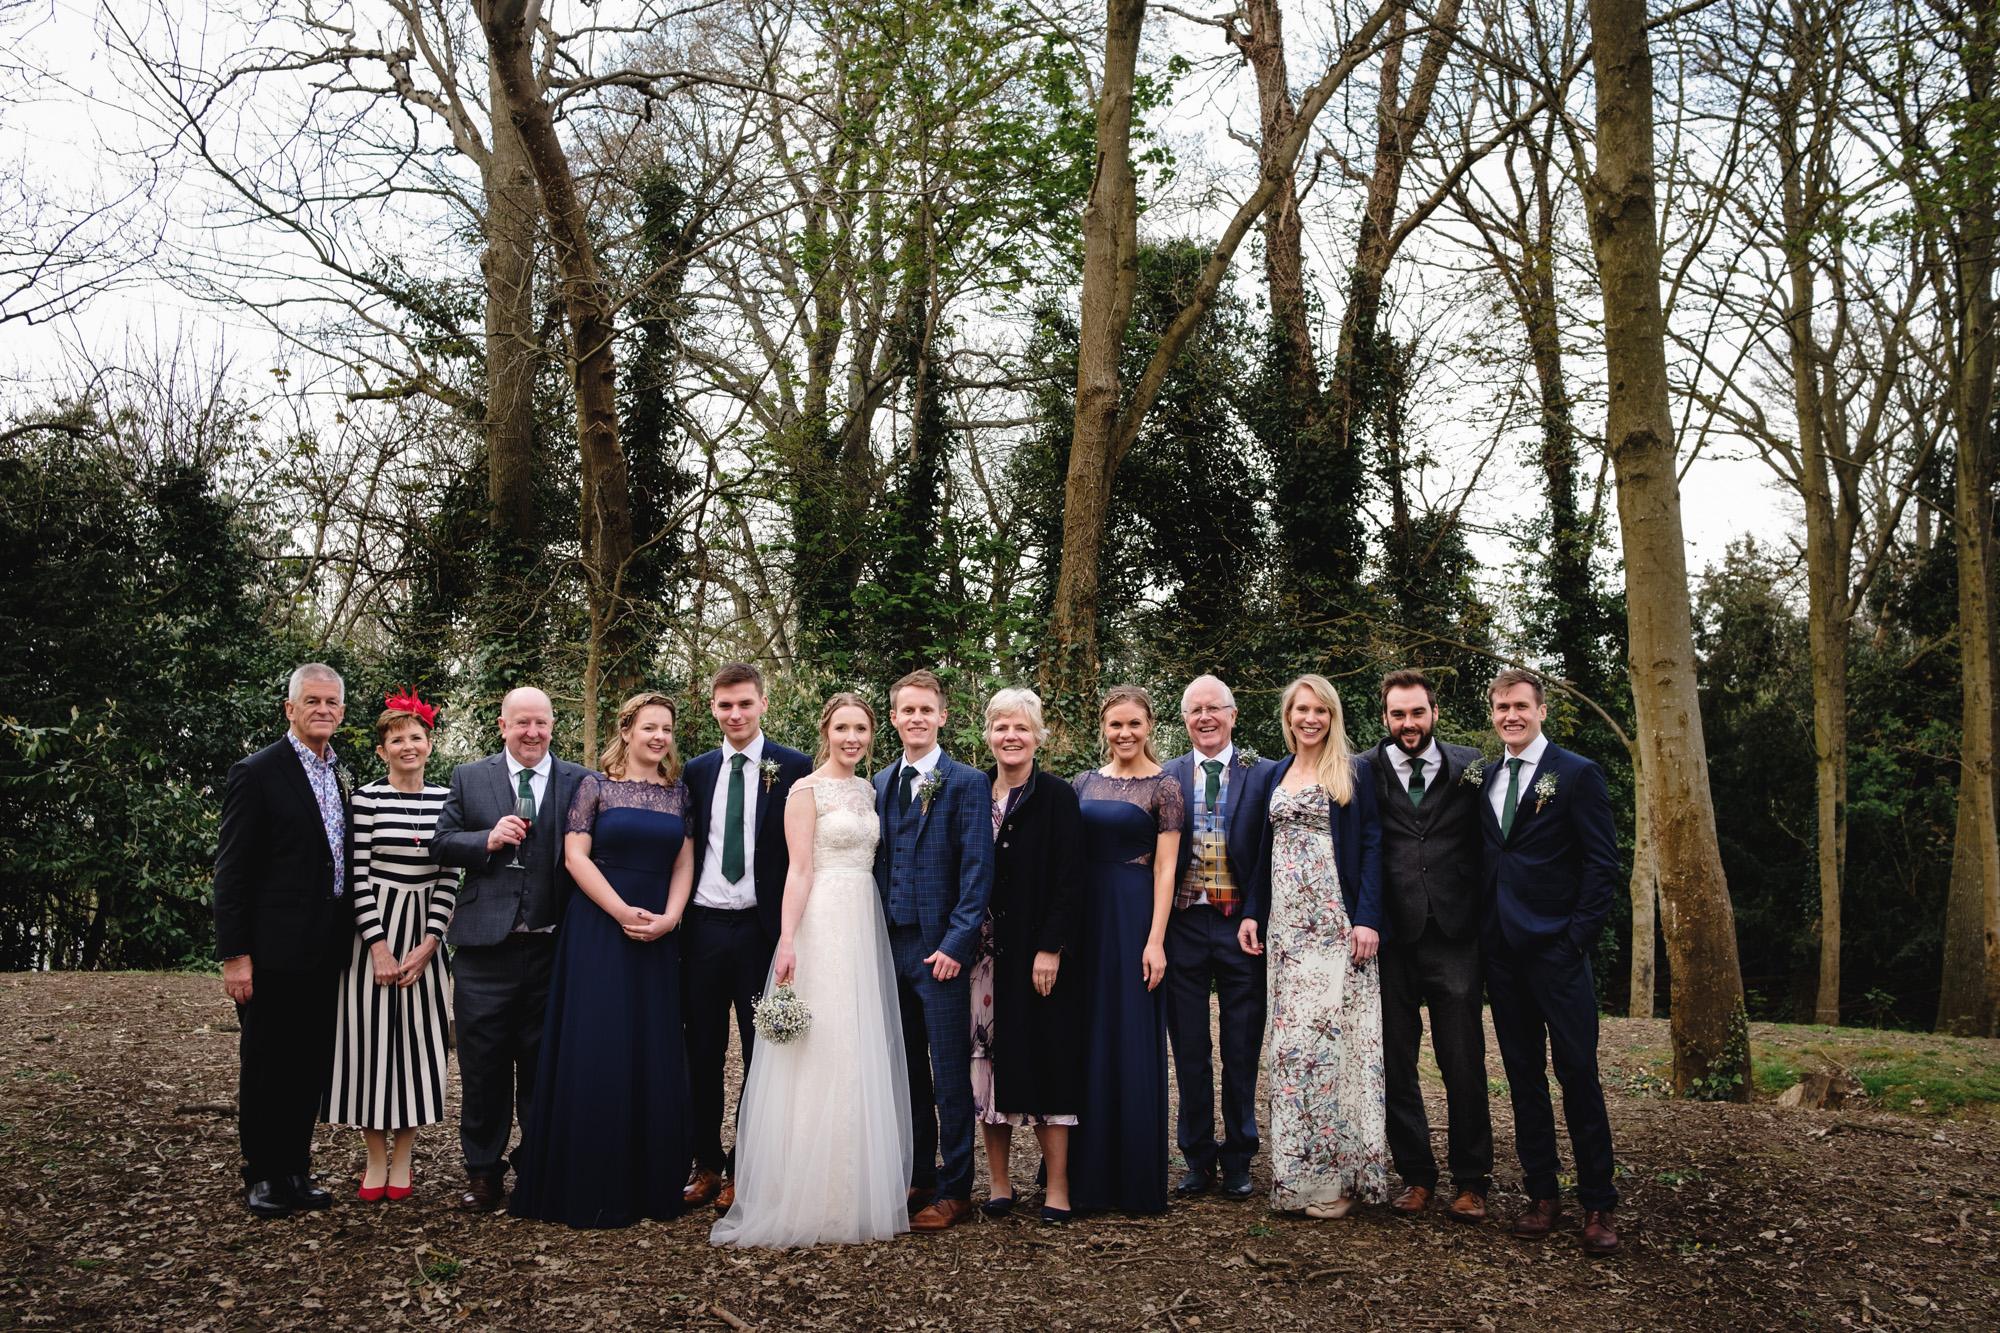 Katie and Dode weddings (120 of 207).jpg